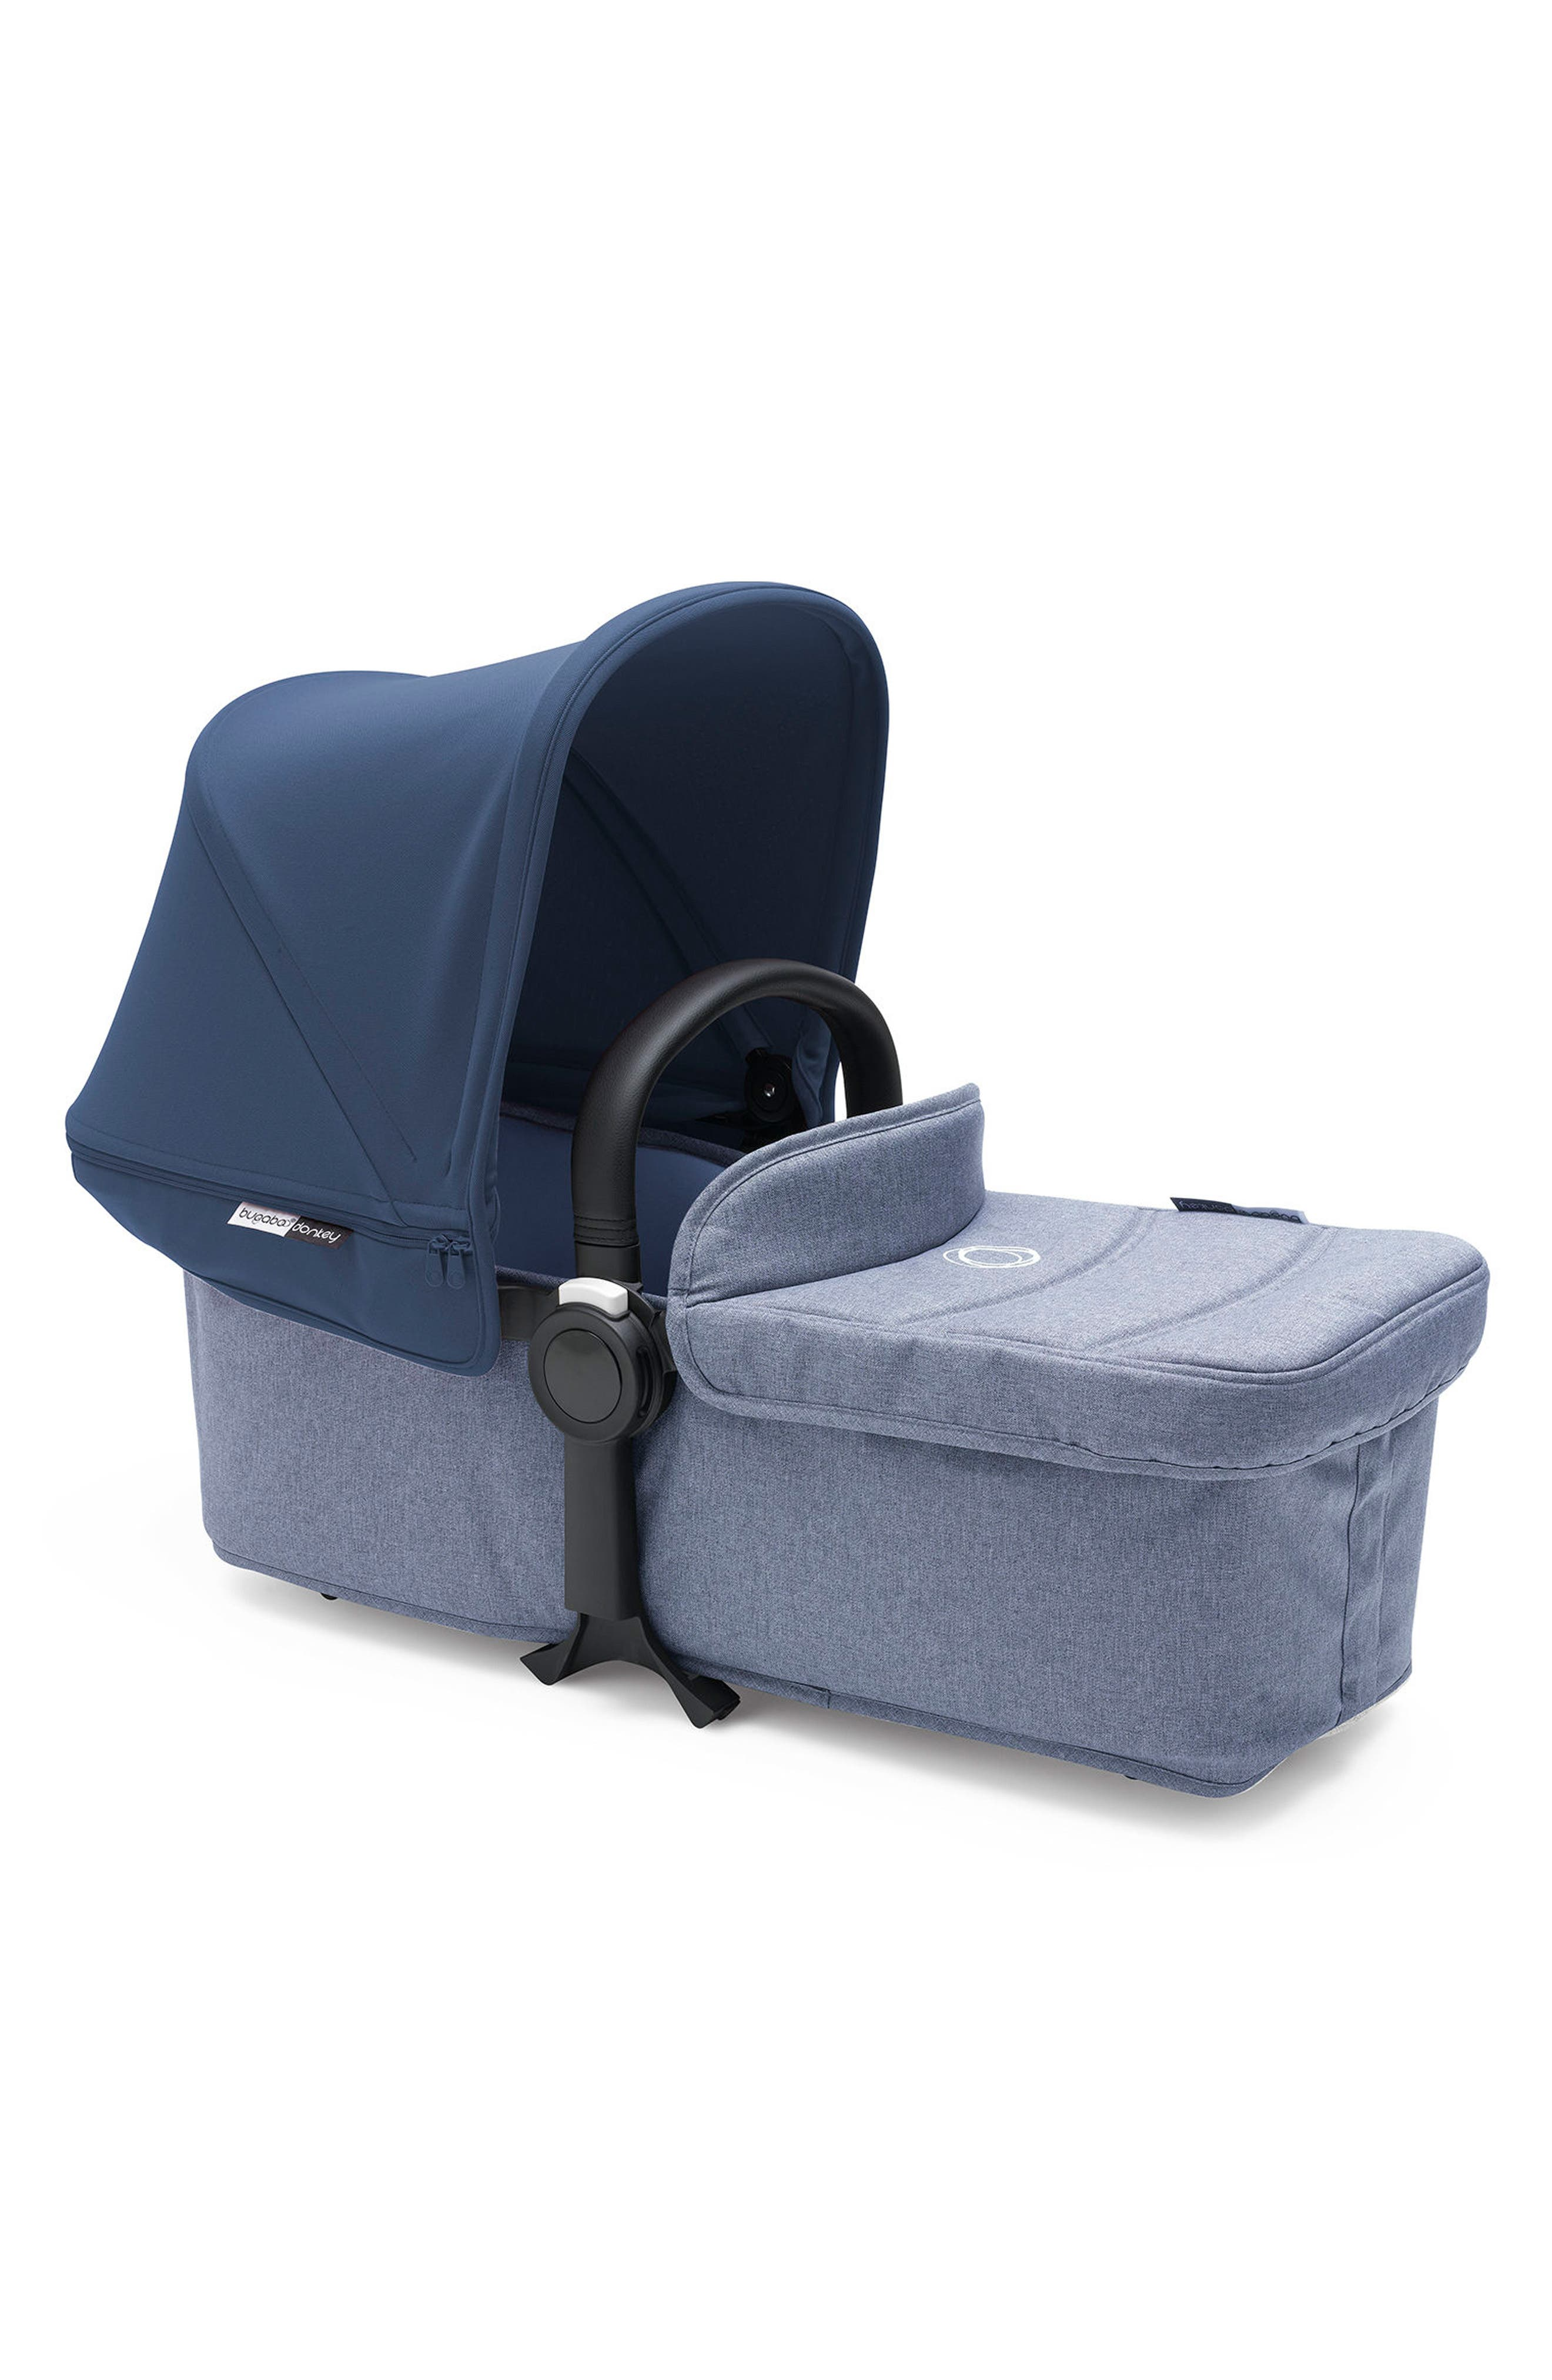 Main Image - Bugaboo Bassinet Tailored Fabric Set for Donkey2 Stroller